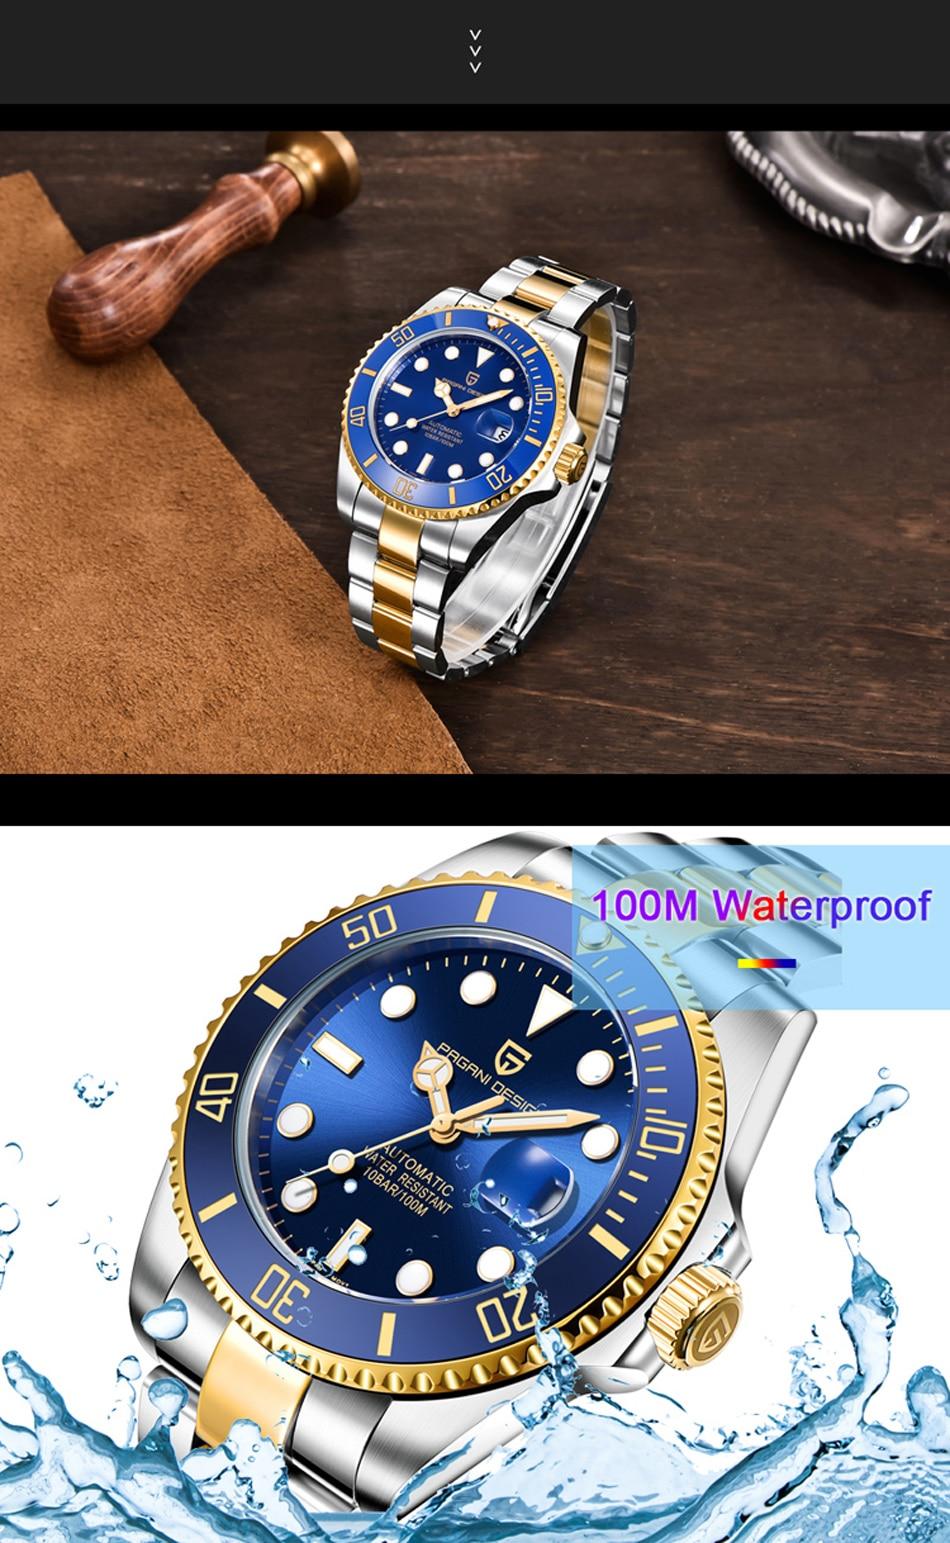 relógio submersível relogio masculino